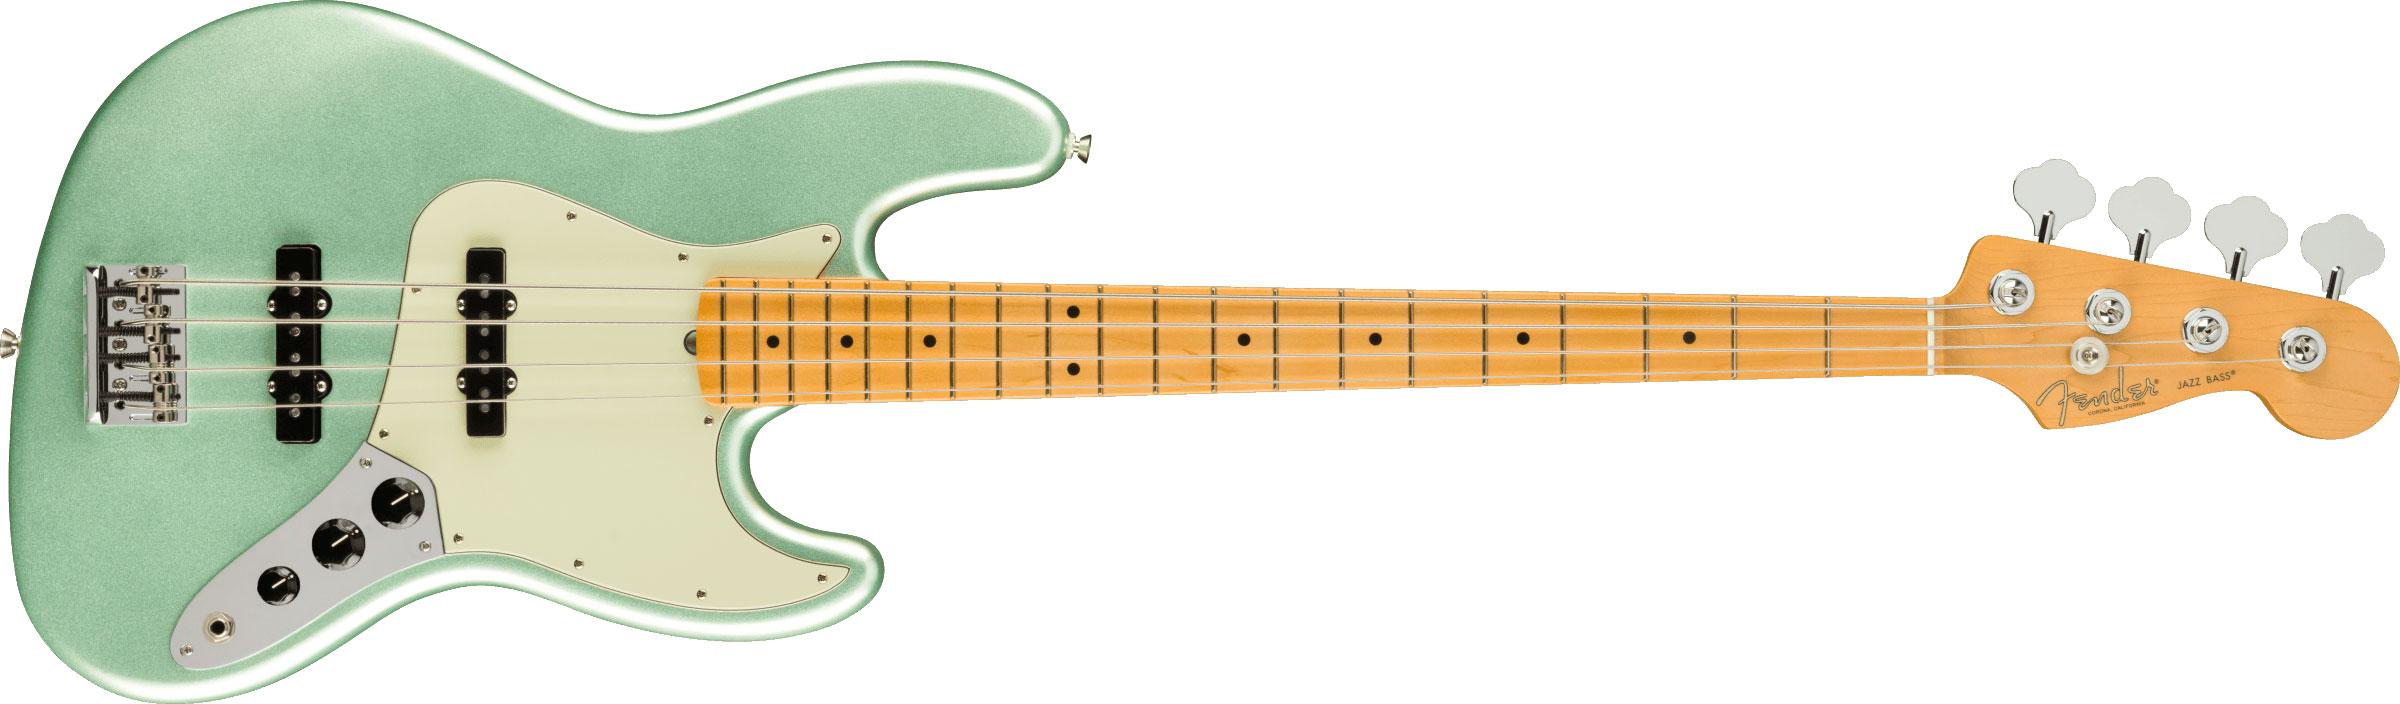 American Professional II Jazz Bass (2020-) 画像1